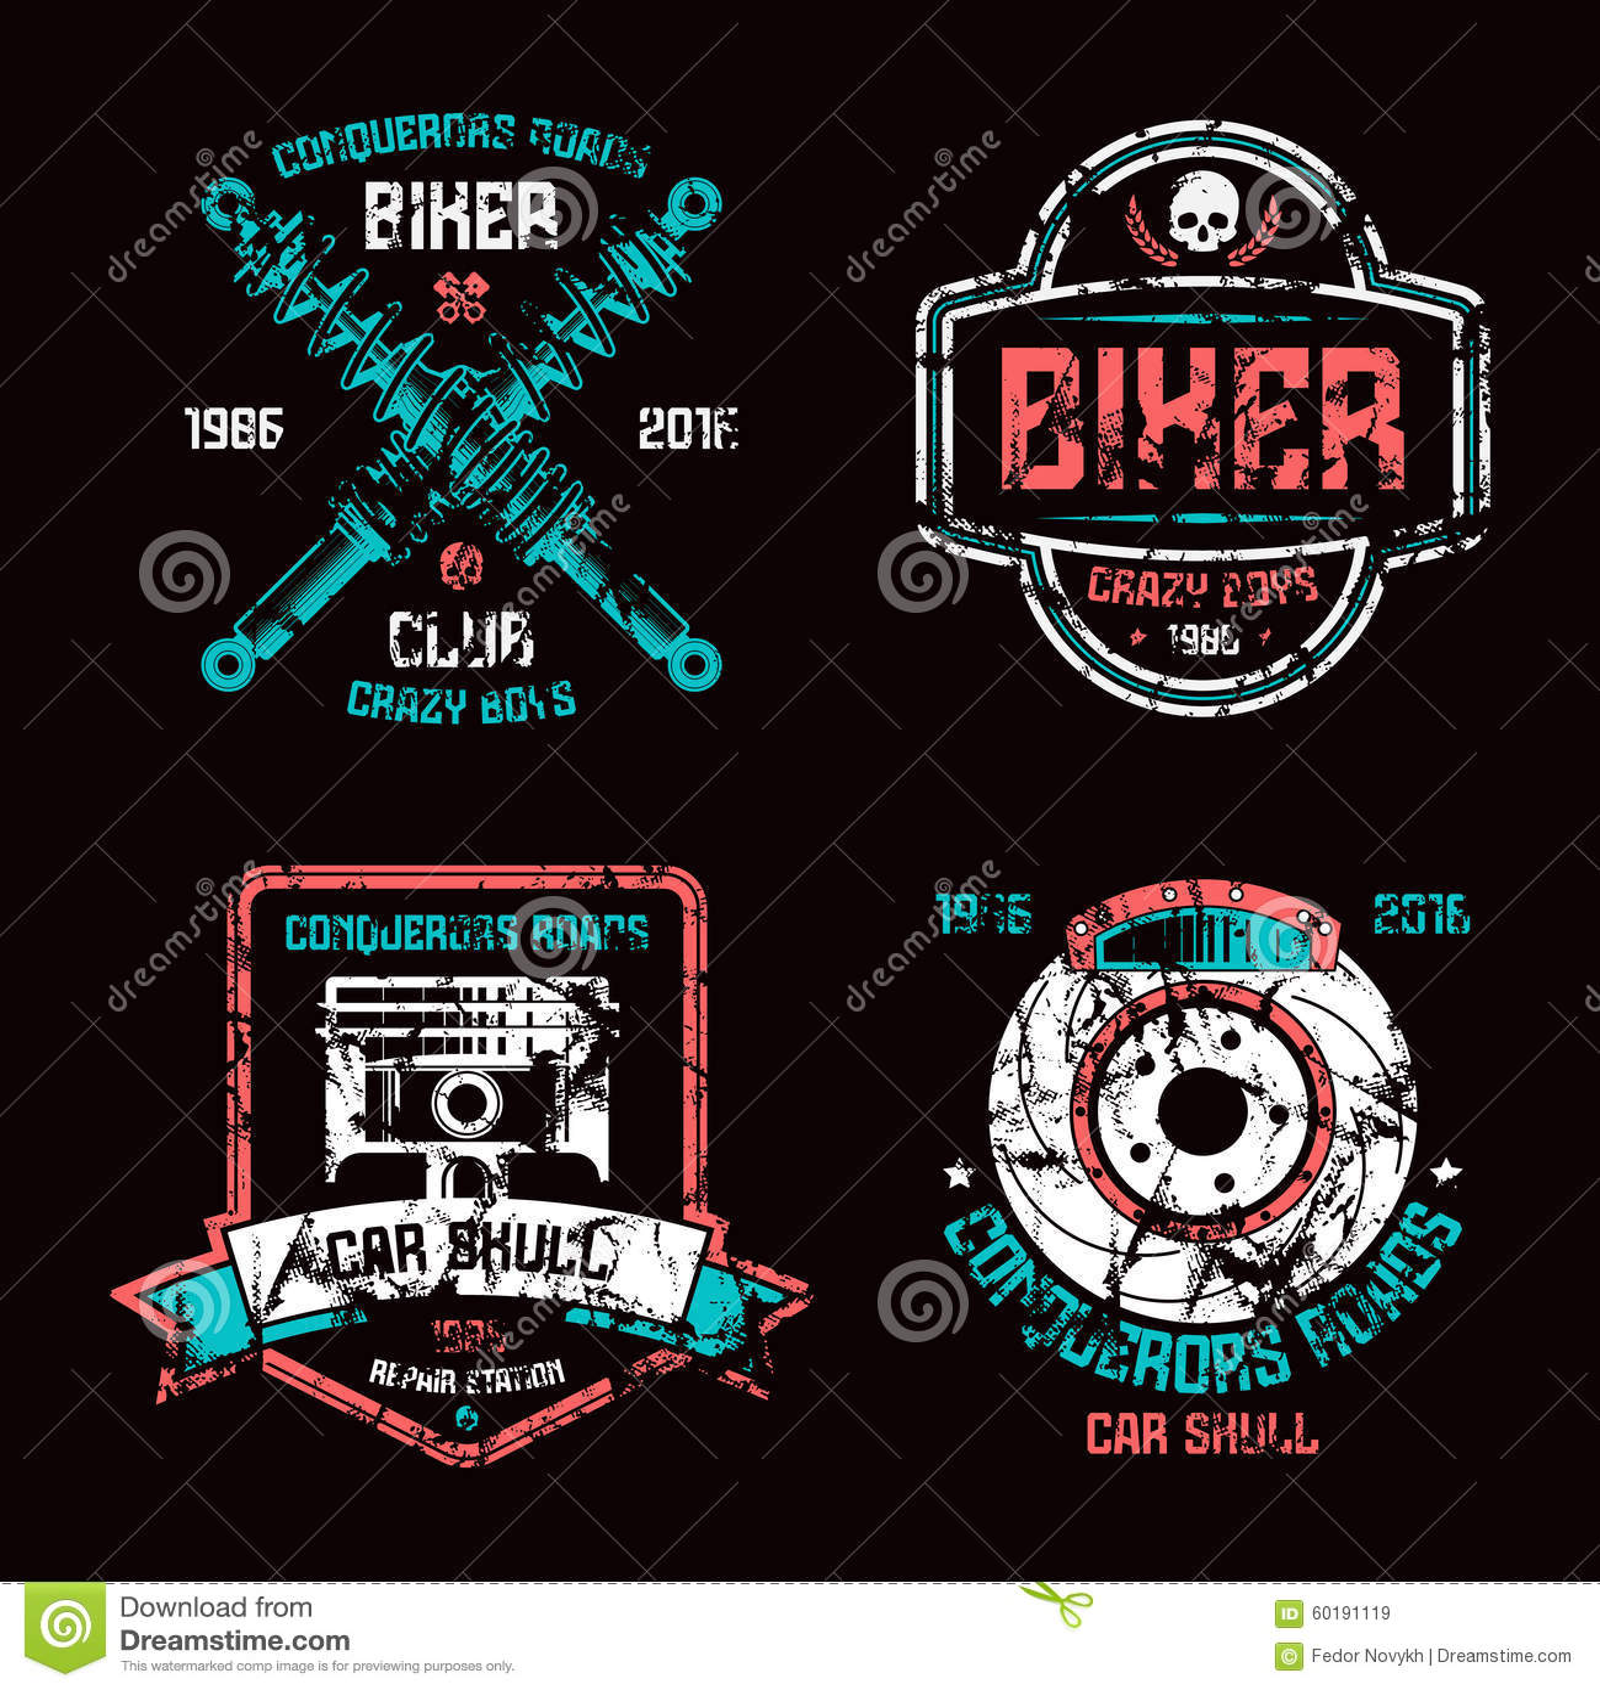 Design car club logo - Biker Black Car Club Color Design